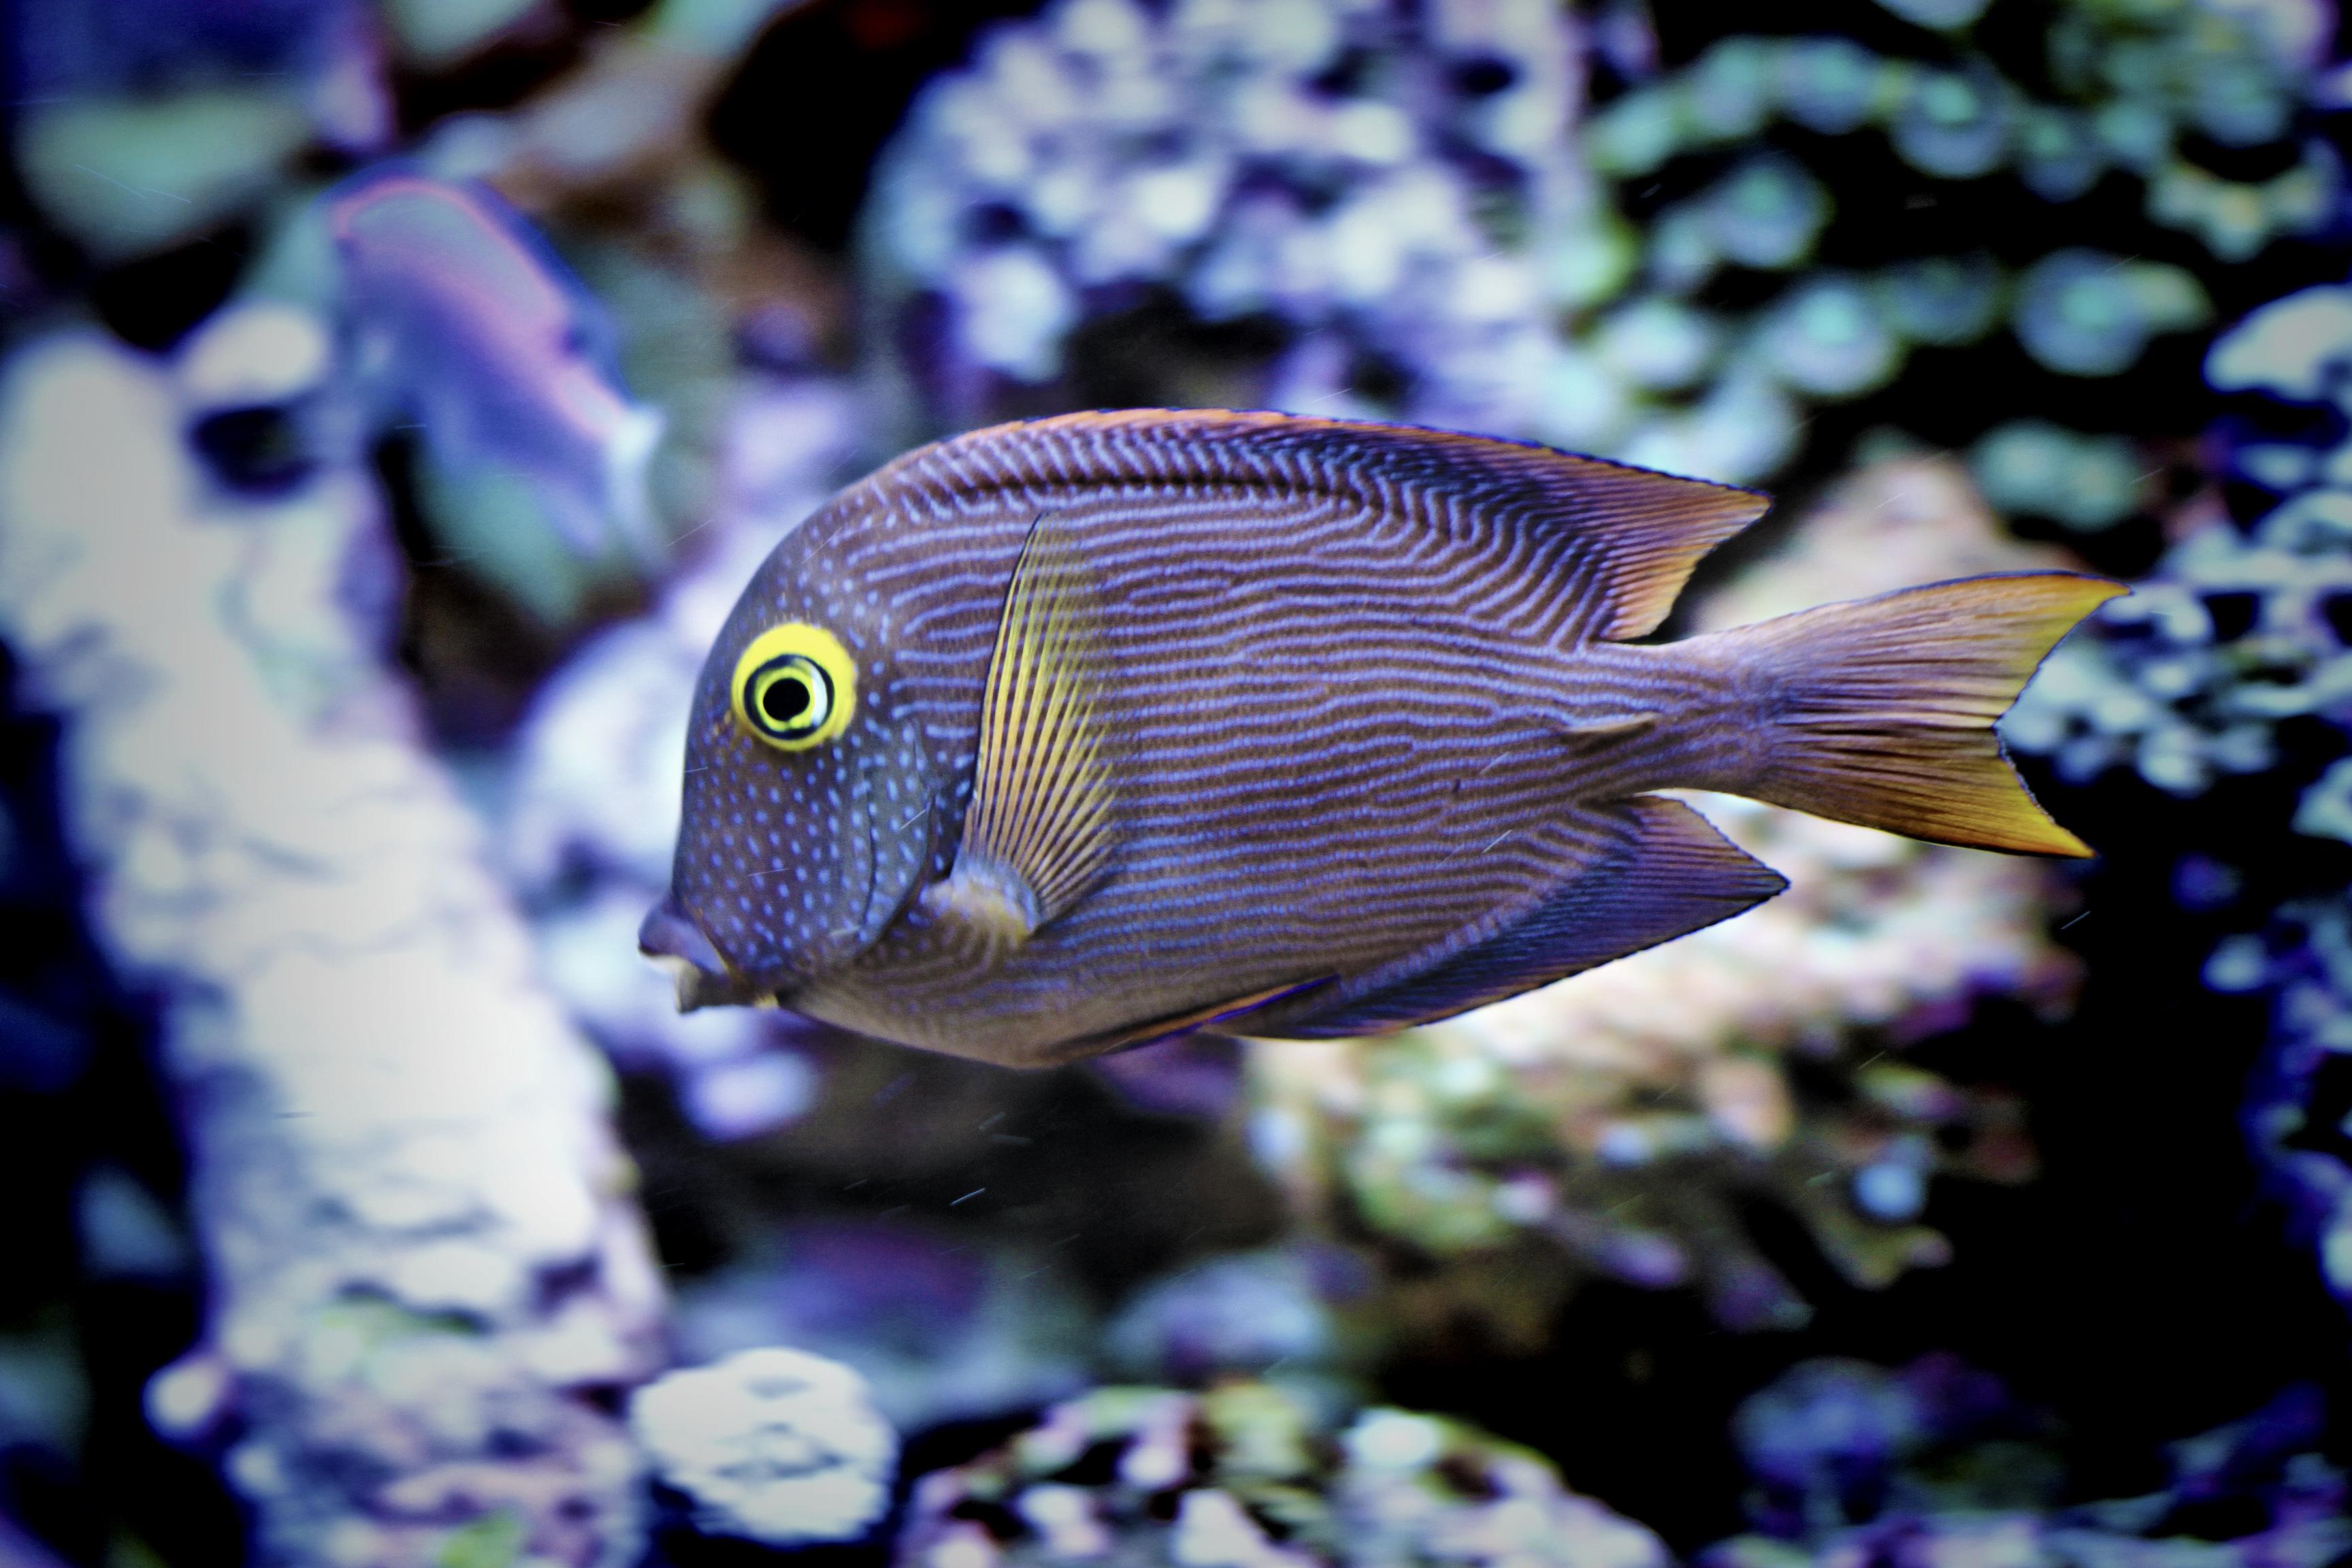 Is Hawaii Aquarium Fishing Headed For A 'Slow-Motion Shutdown'?